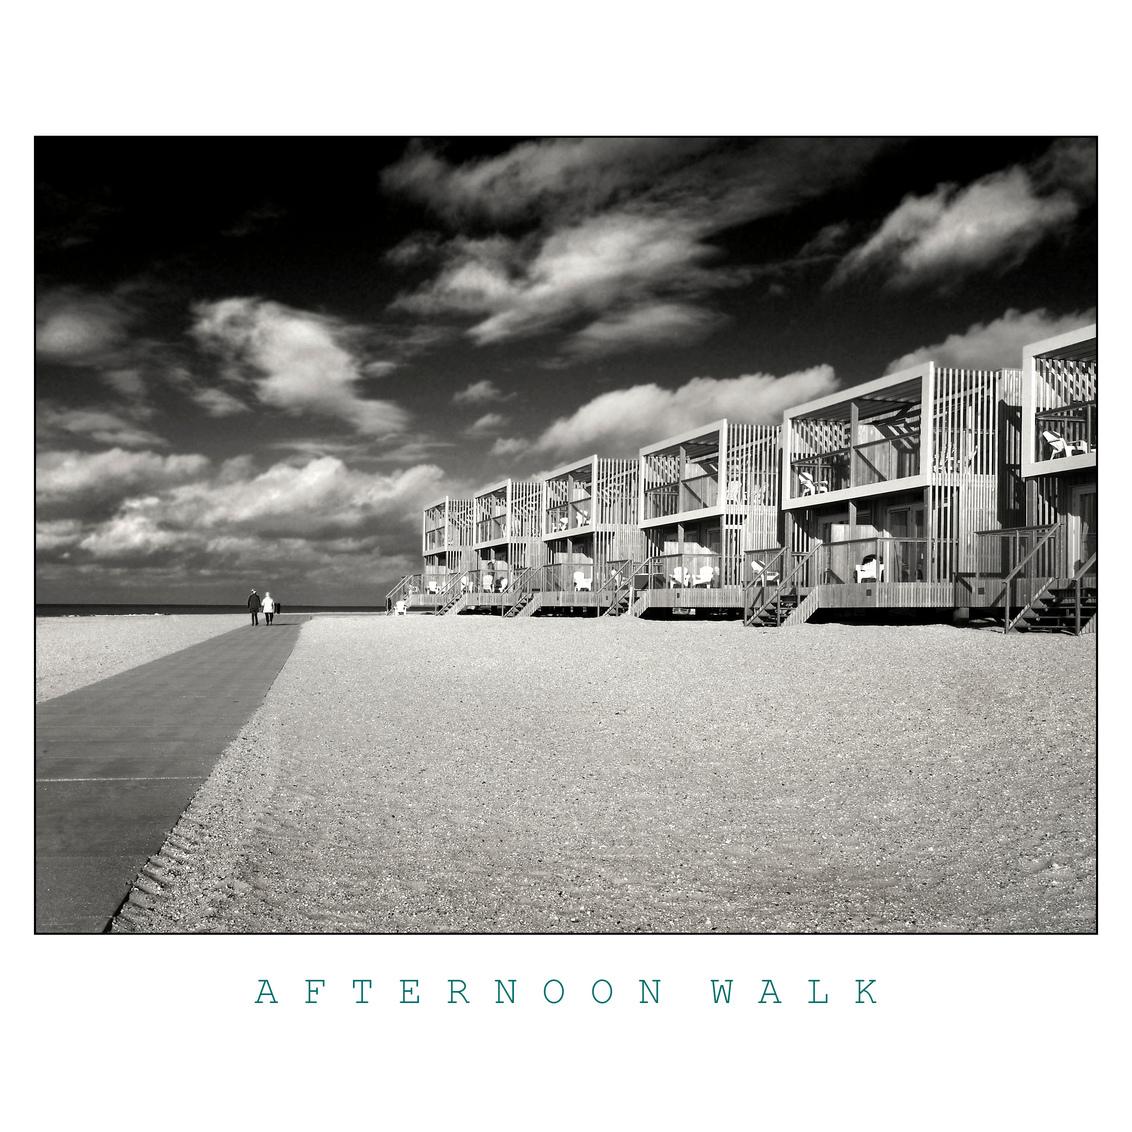 AFTERNOON WALK - - - foto door fonsbitter op 28-10-2020 - deze foto bevat: wolken, strand, zee, zand